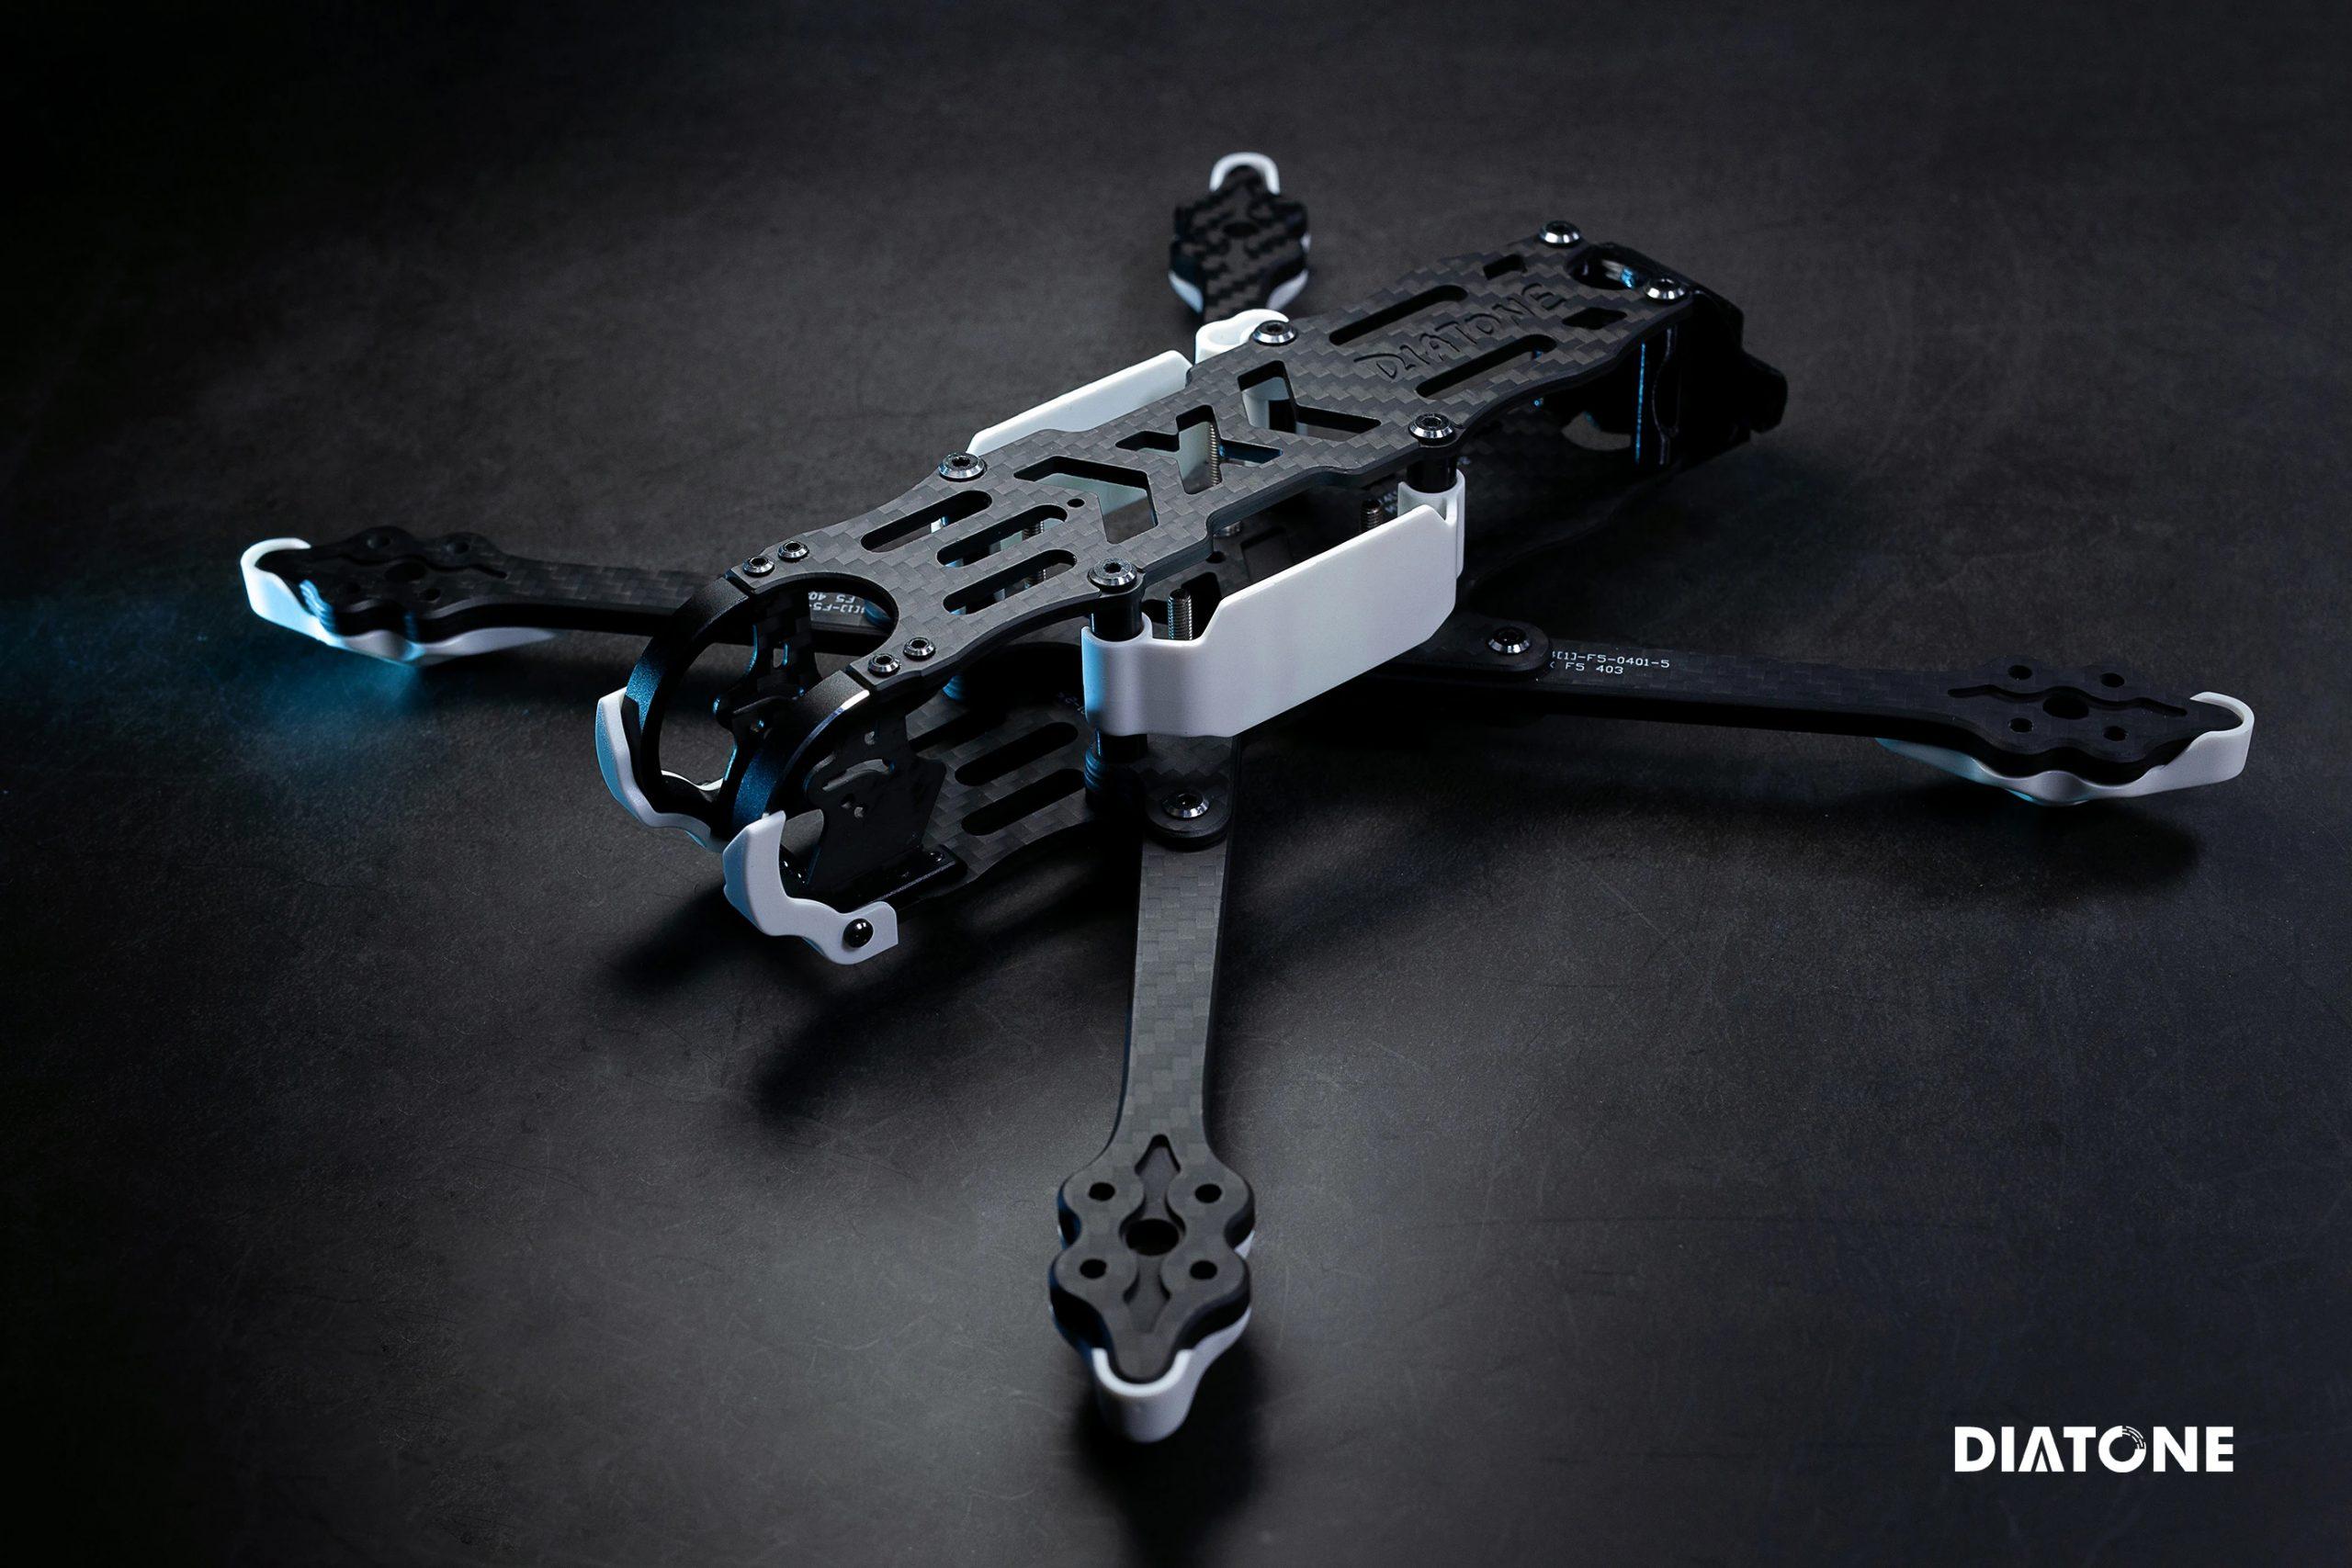 DIATONE Roma F5 5inch Freestyle Frame Kit (dji & Standard)